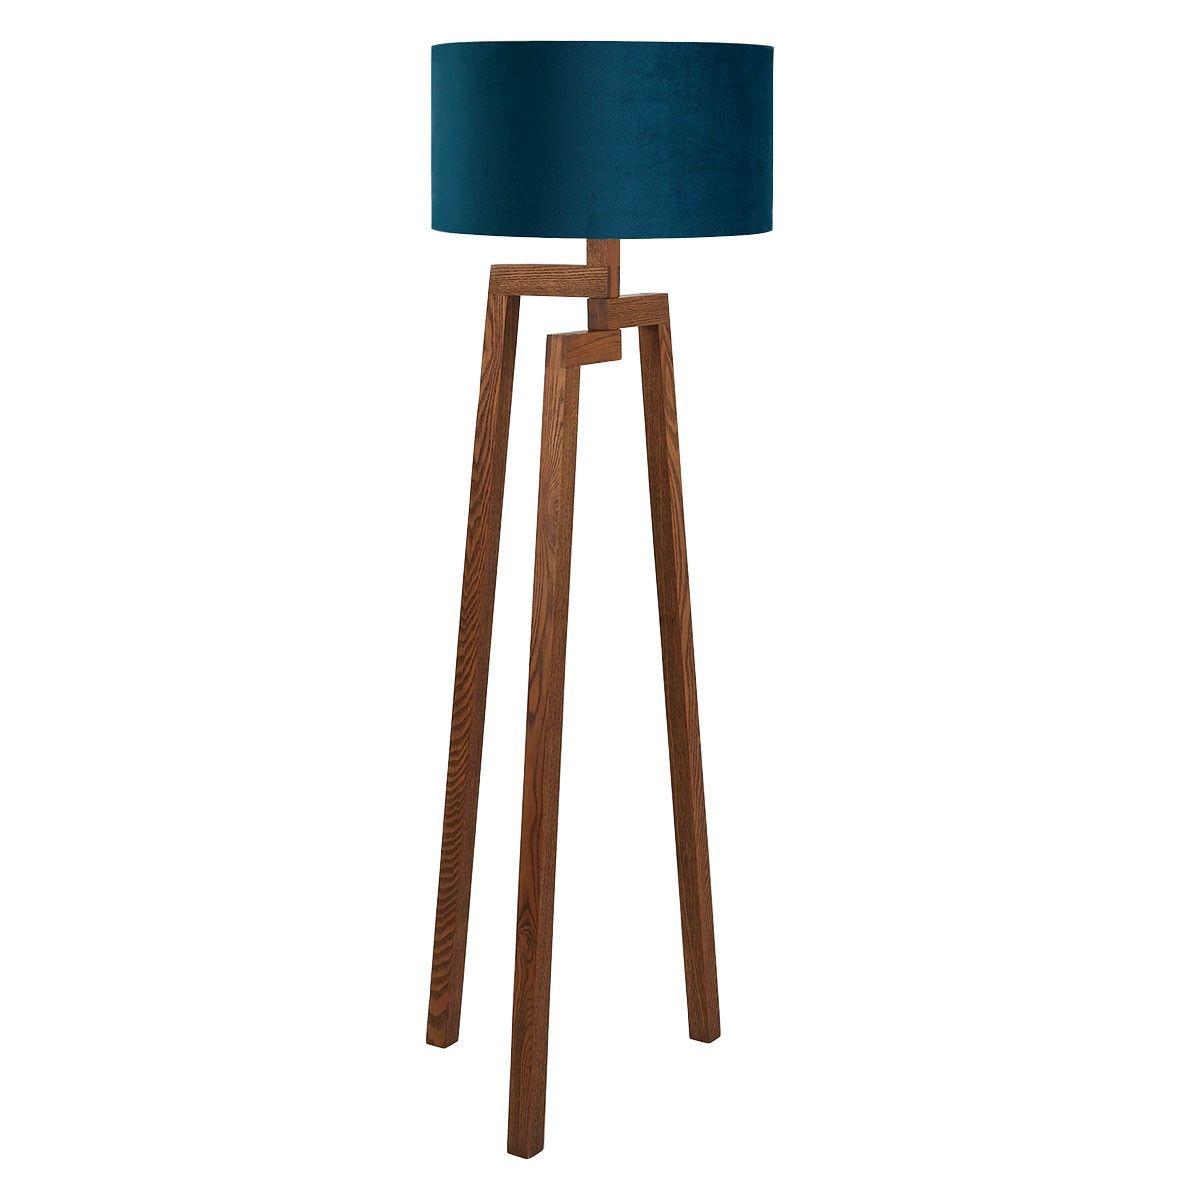 Dylan Walnut Wooden Floor Lamp With Green Velvet Shade